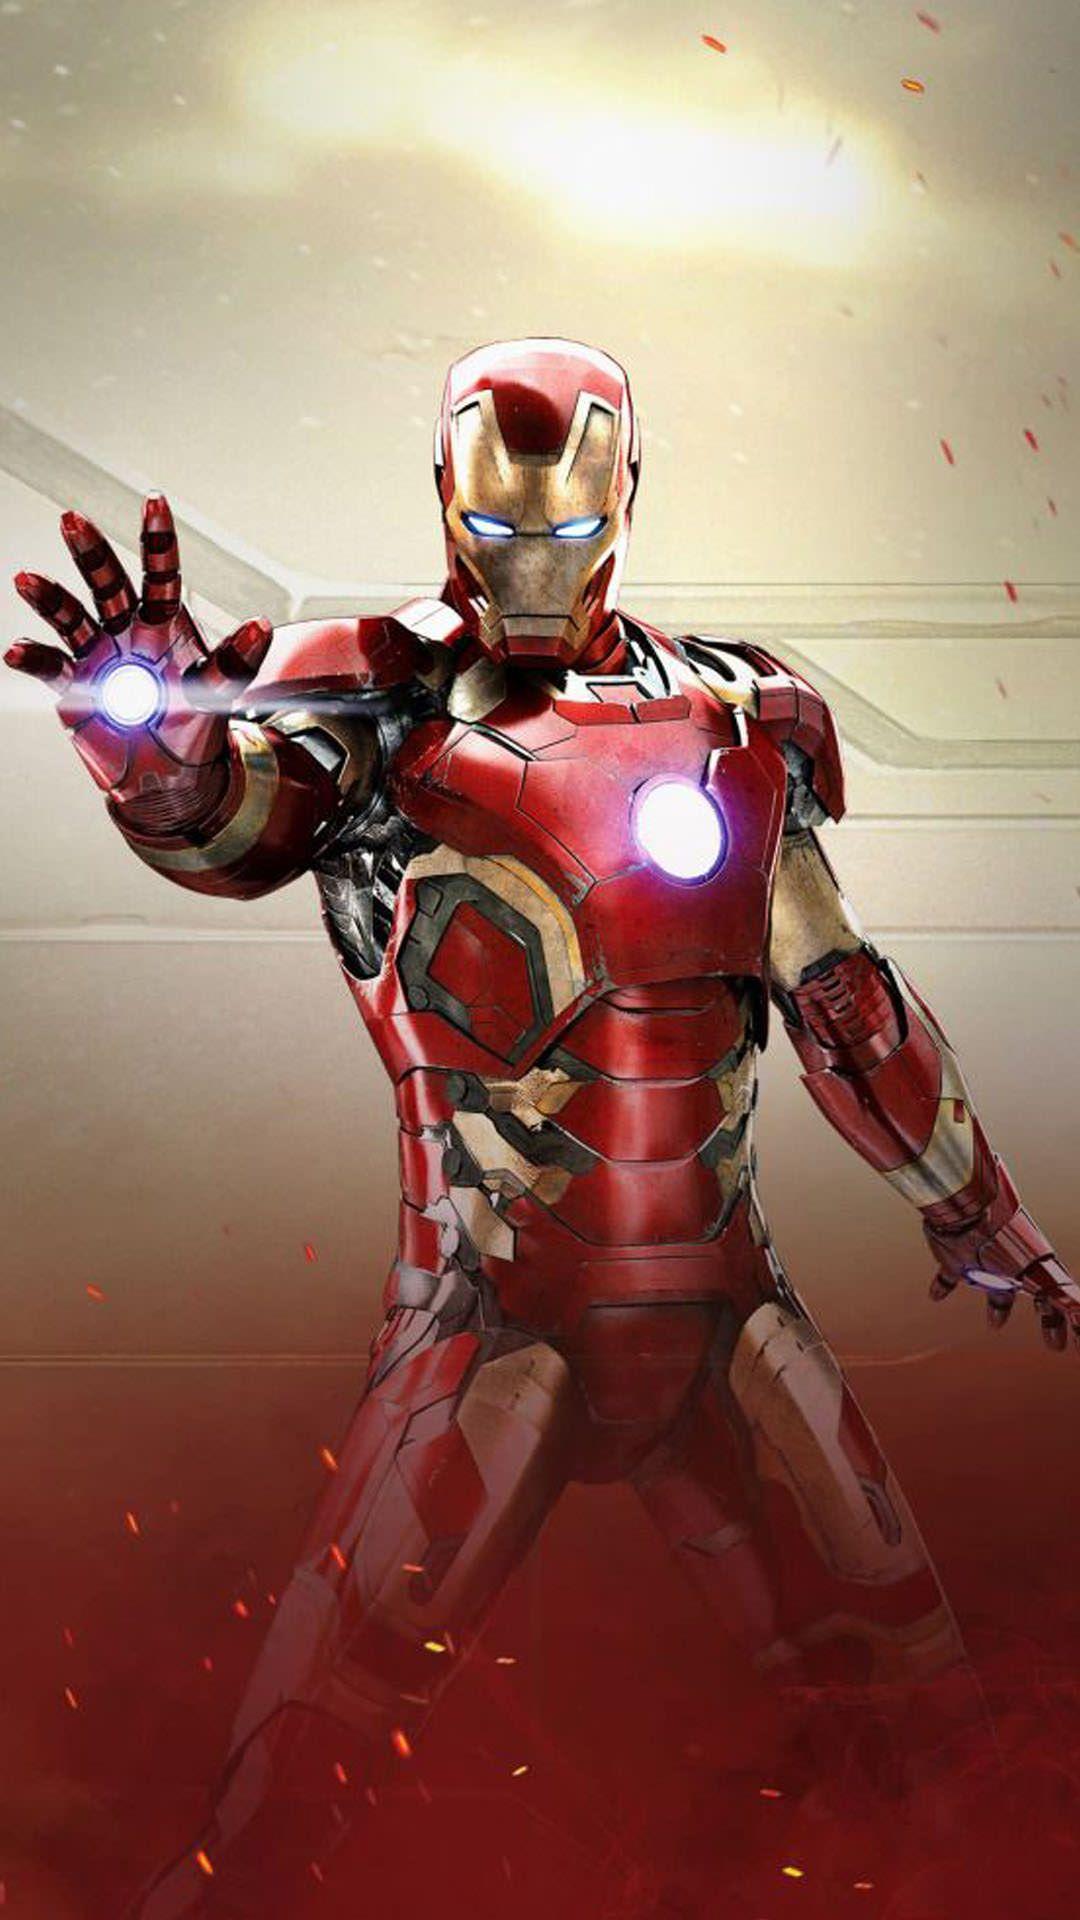 35 Best Iron Man Iphone Wallpapers 2019 Iron Man Wallpaper